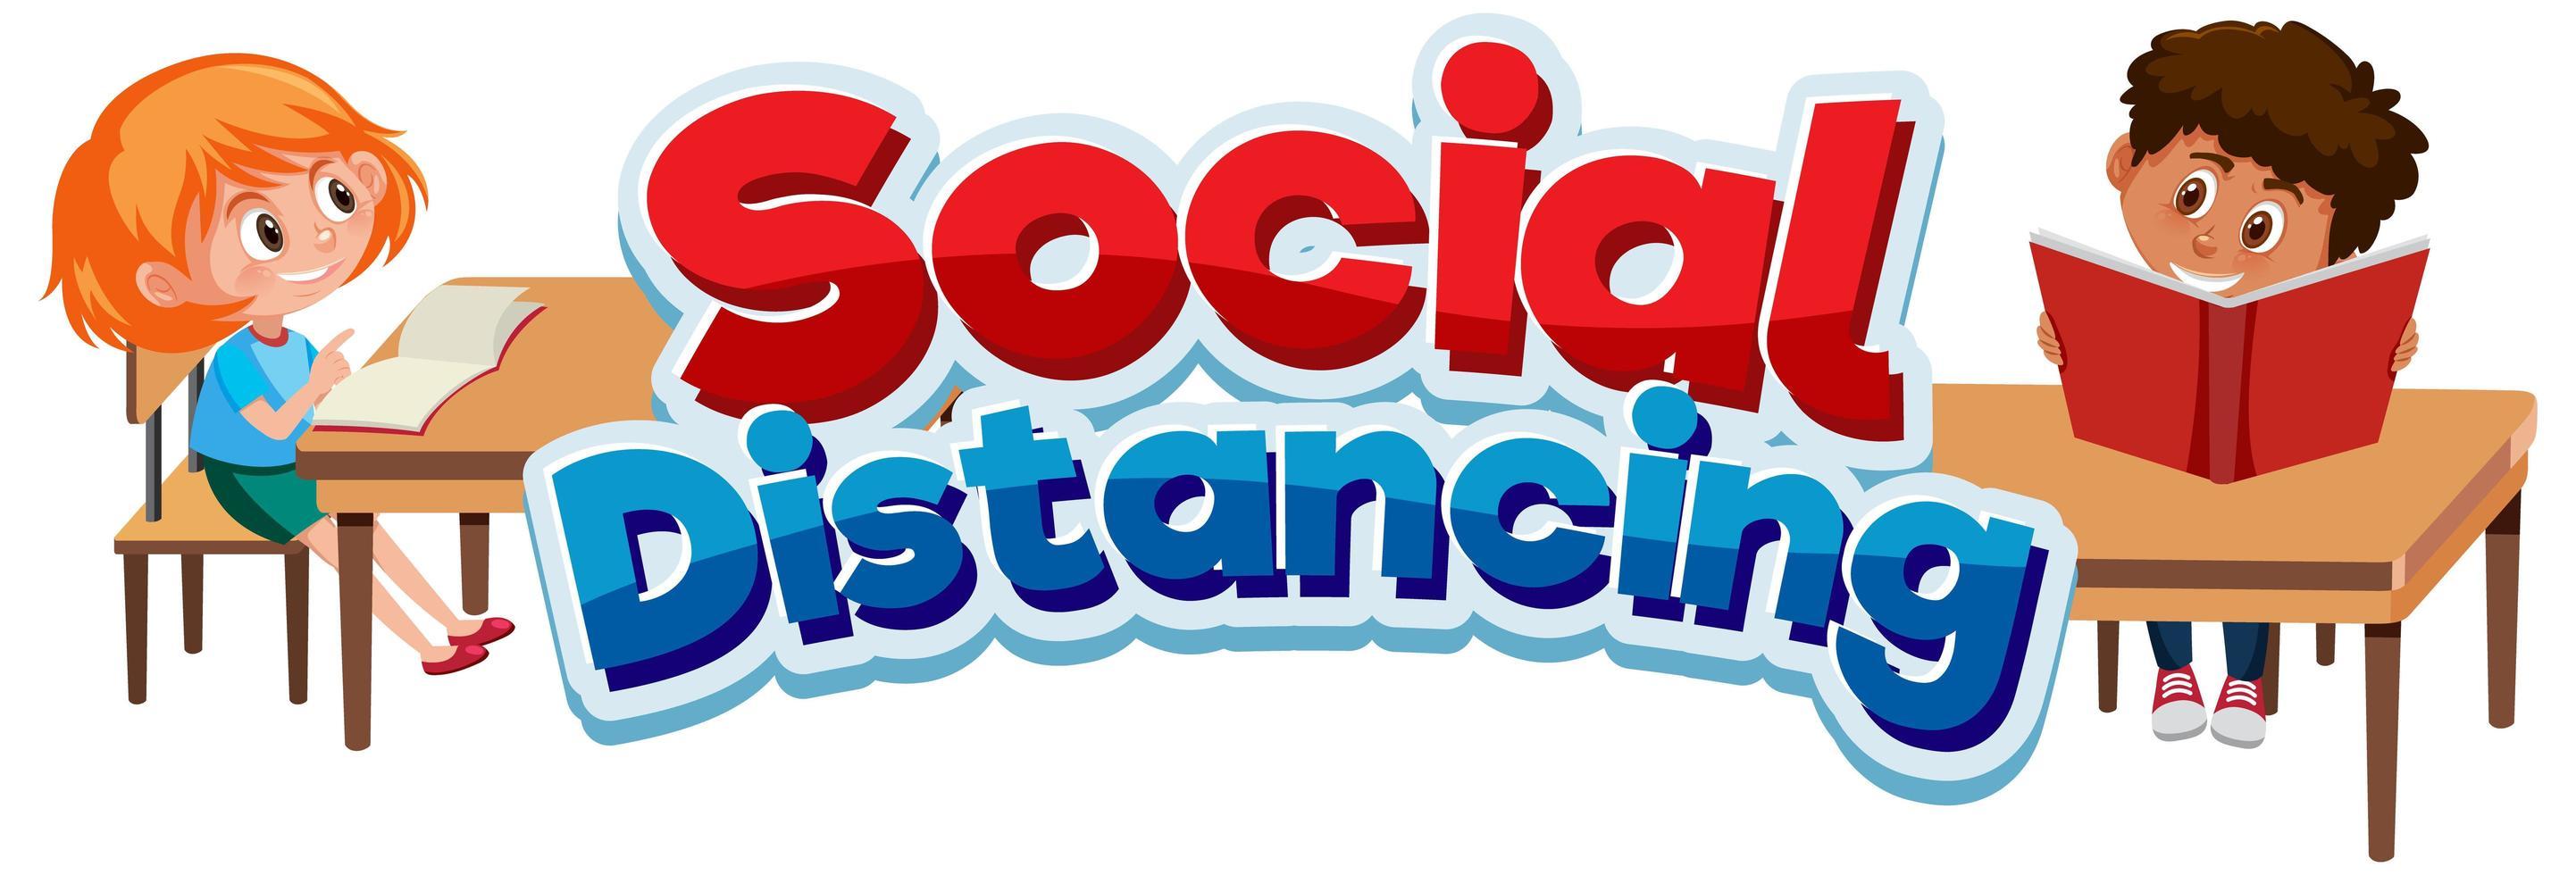 Social Distancing And Happy Children At School Download Free Vectors Clipart Graphics Vector Art